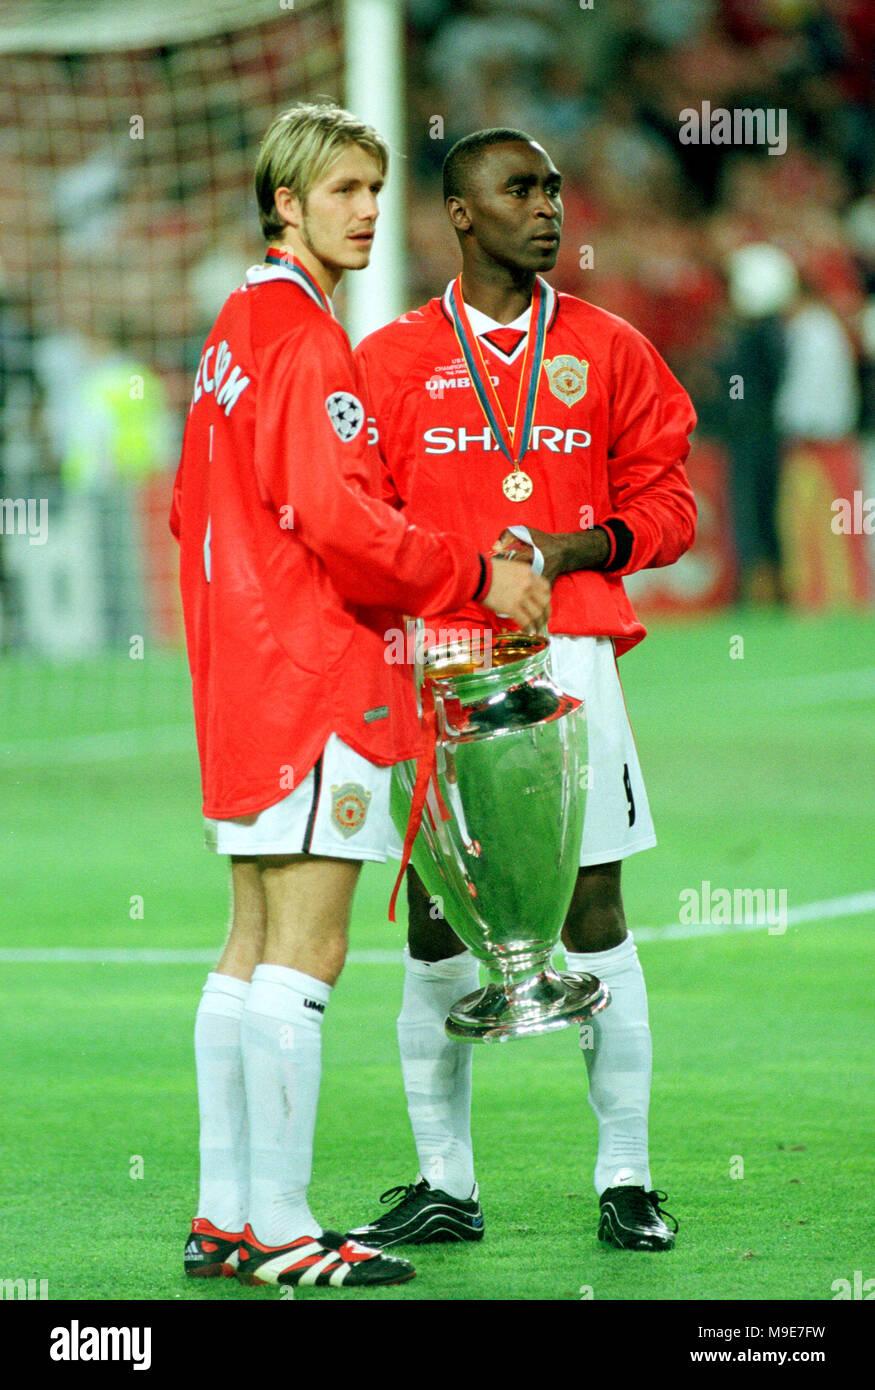 Stadium Camp Nou Barcelona Spain 2651999 UEFA Champions League Final Manchester United Vs FC Bayern Munich 21 David Beckham And Andy Cole All